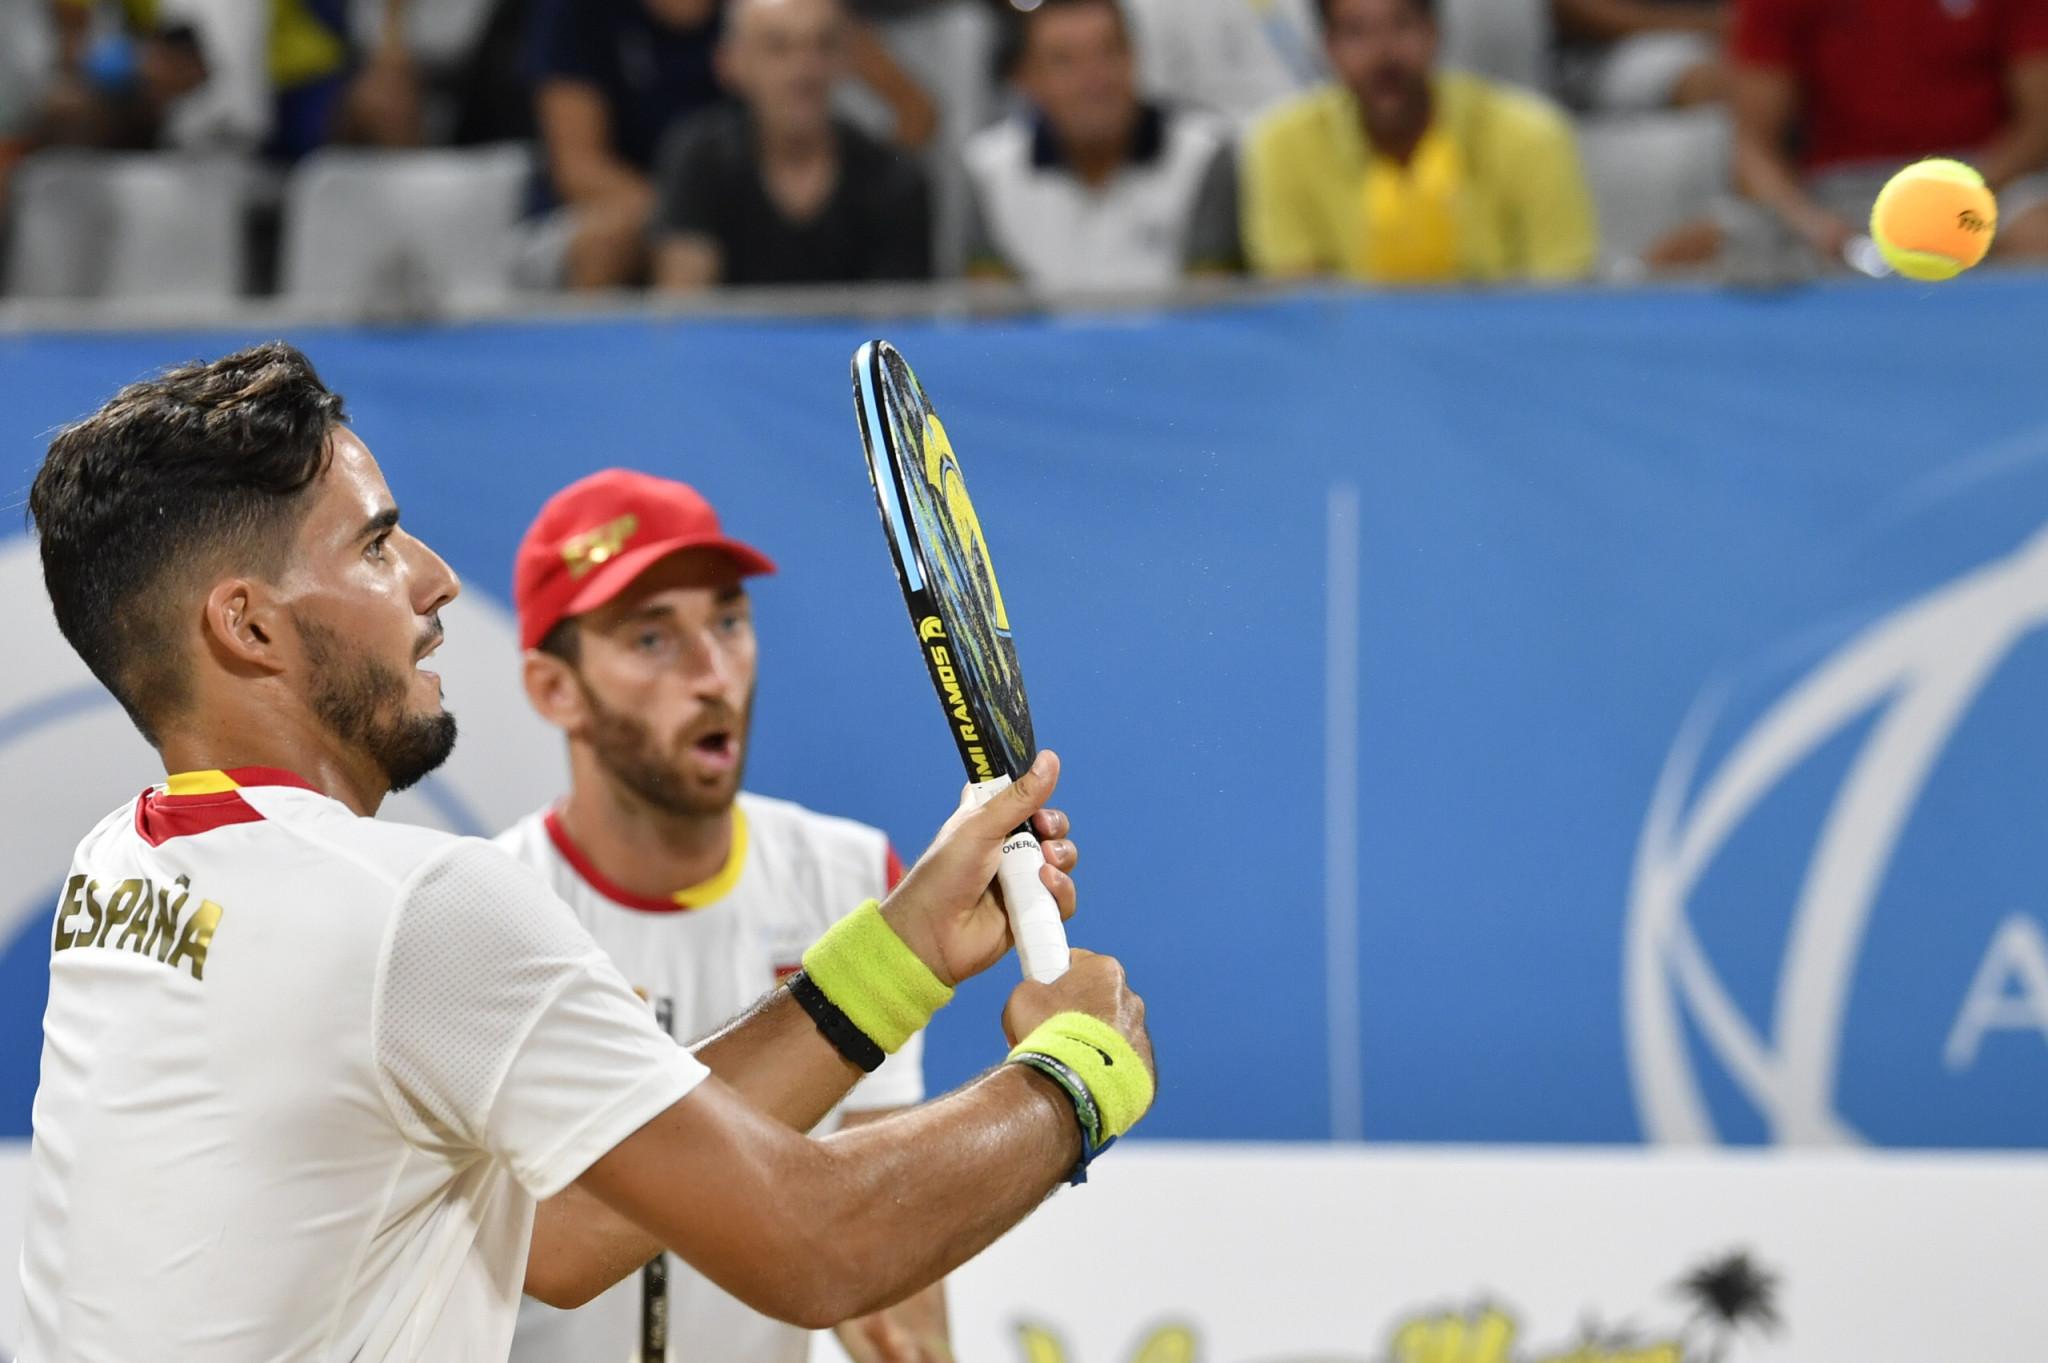 Spain;s Antonio Ramos and Gerard Rodriquez won the men's beach tennis ©ANOC World Beach Games